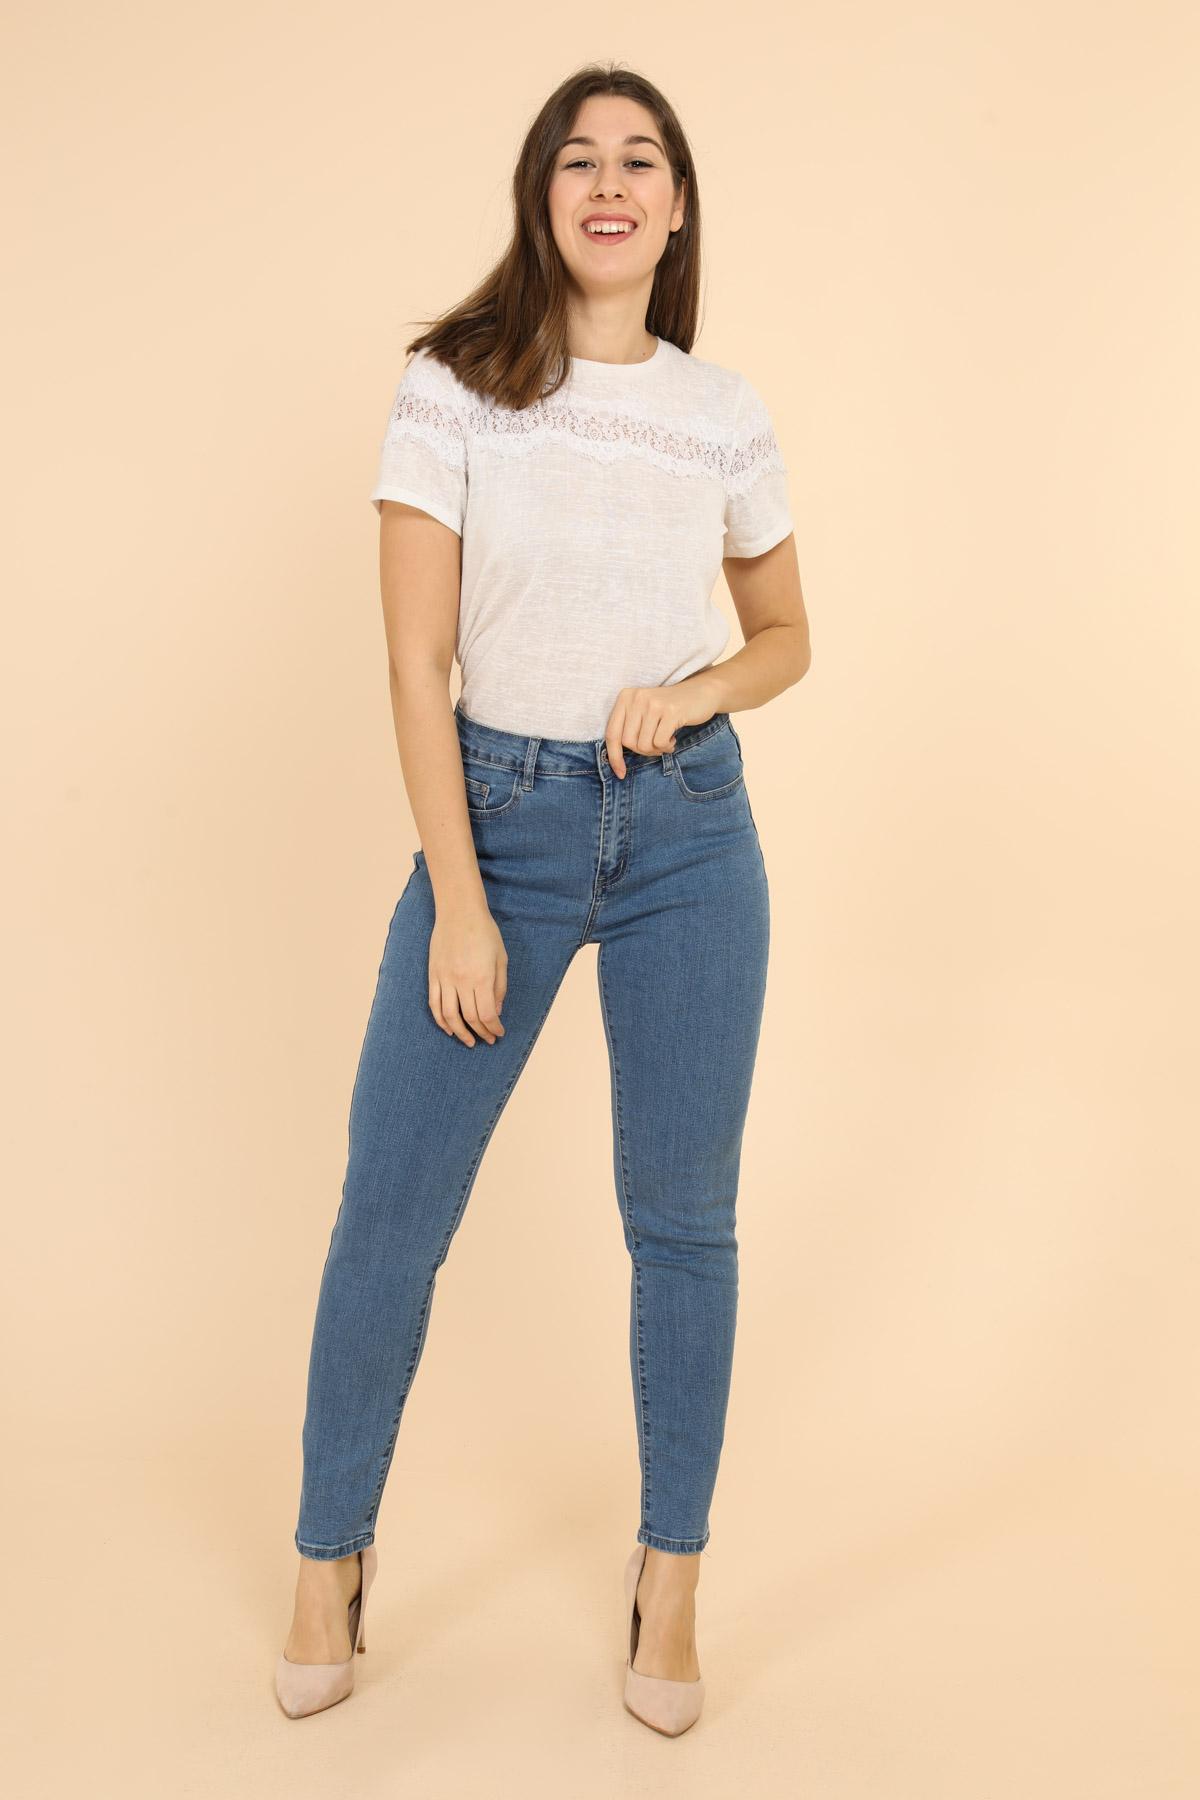 Pantalons Femme Bleu jean MELENA DIFFUSION (anciennement ALINA)  B09 #c Efashion Paris